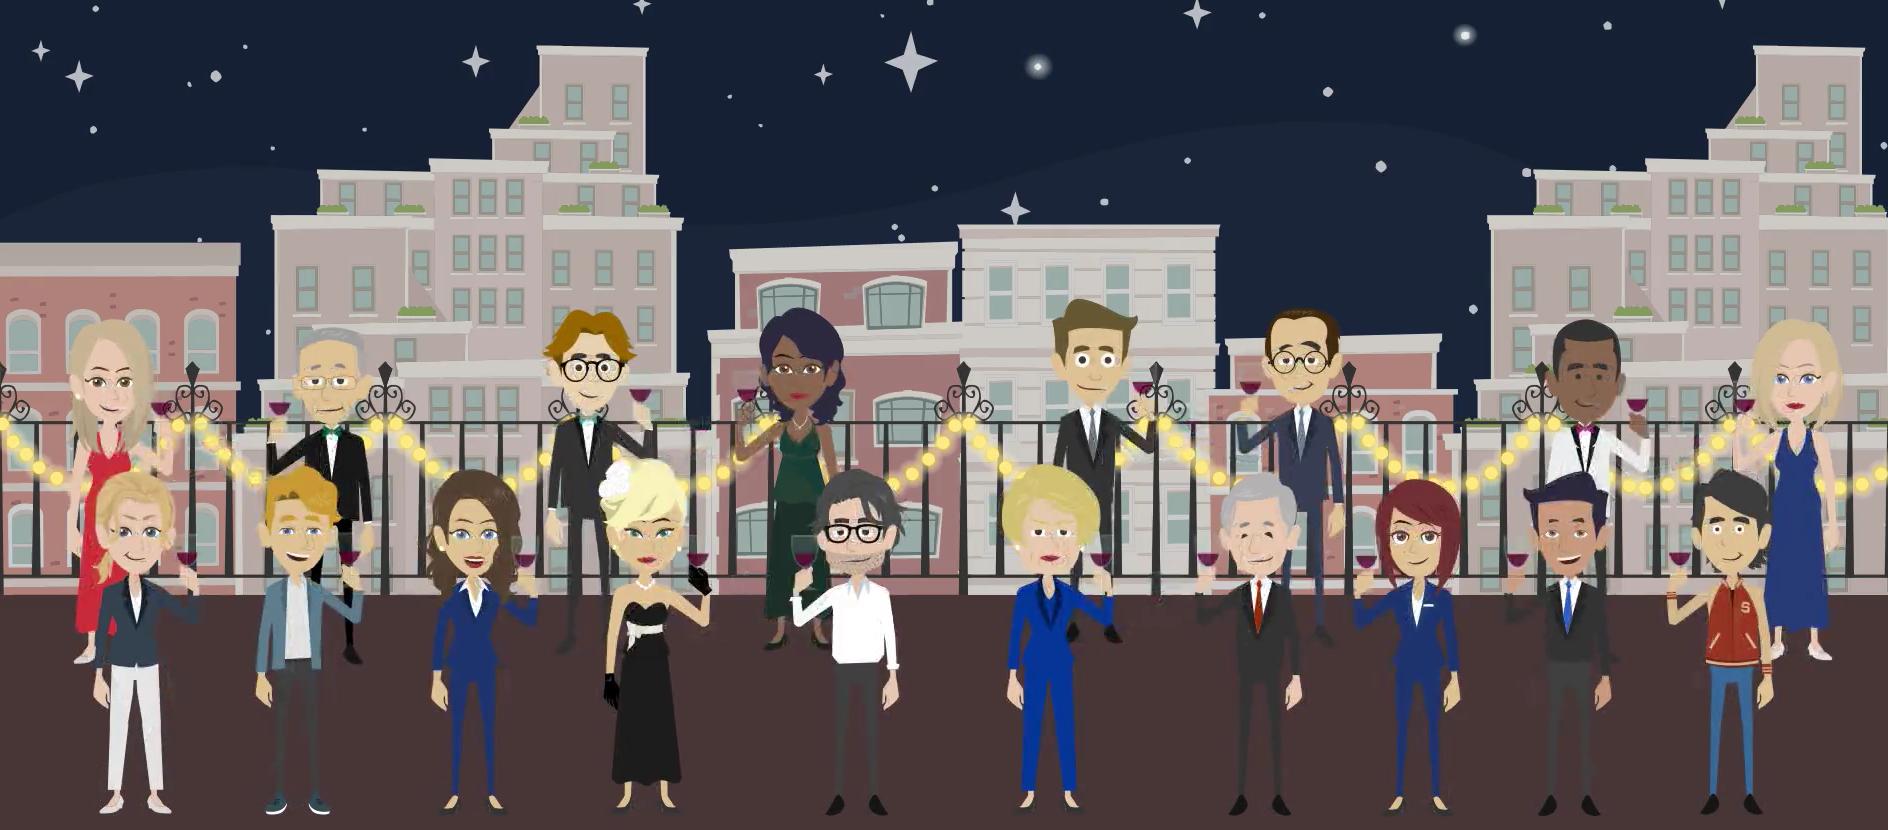 Animation video as an original Christmas message